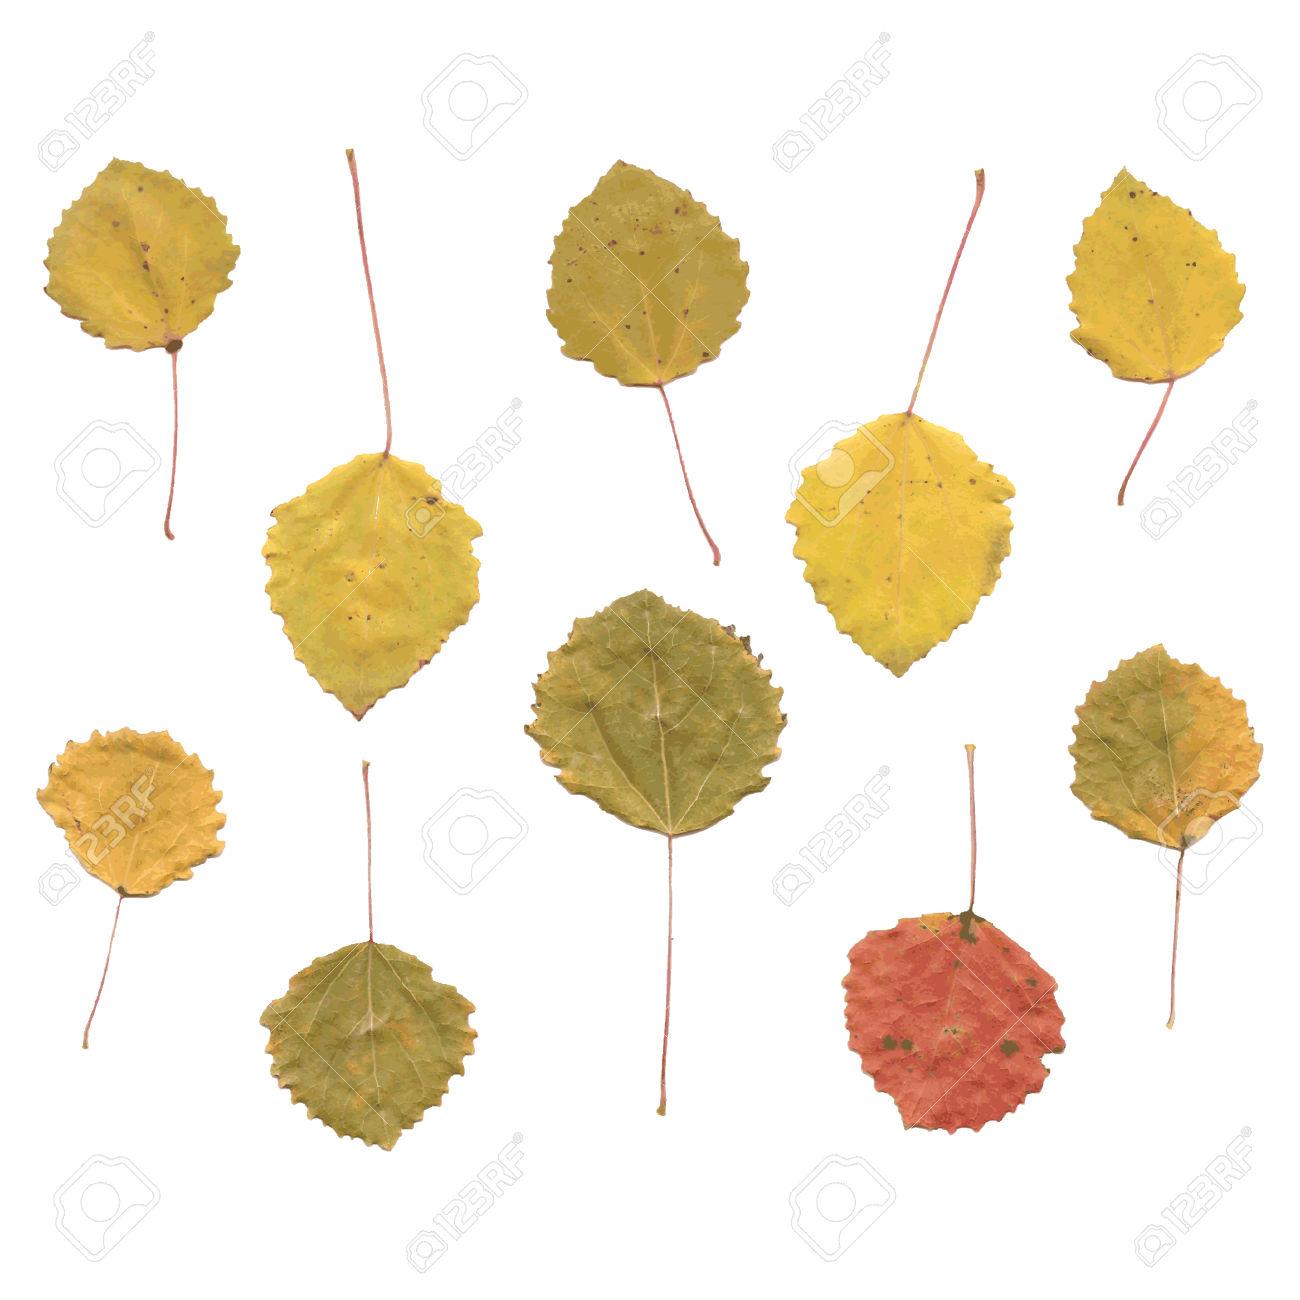 Autumn Birch Or Betula, Aspen Or Populus Tremula Leaves, Set.